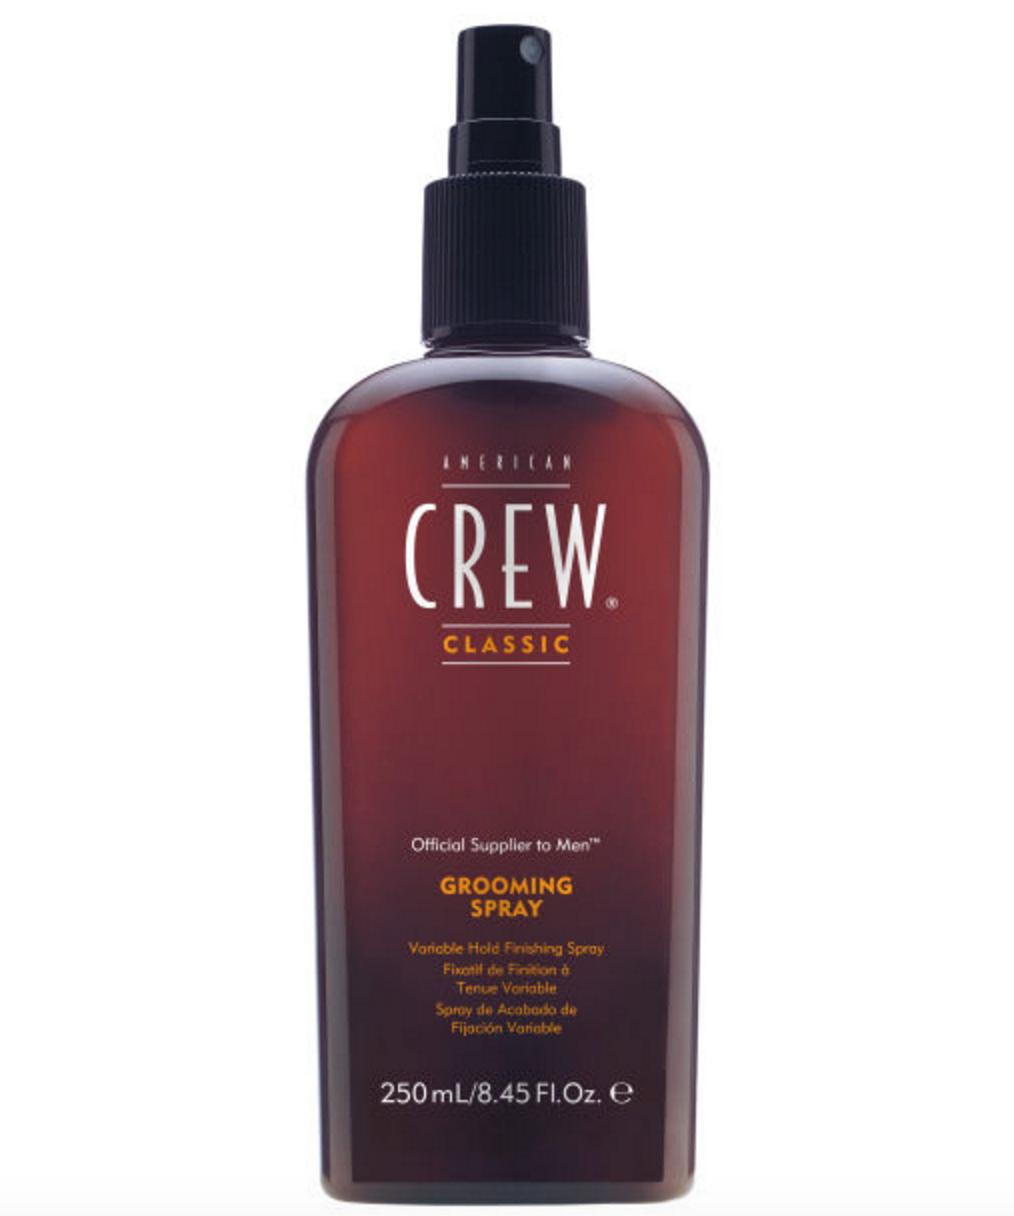 Grooming Spray American Crew